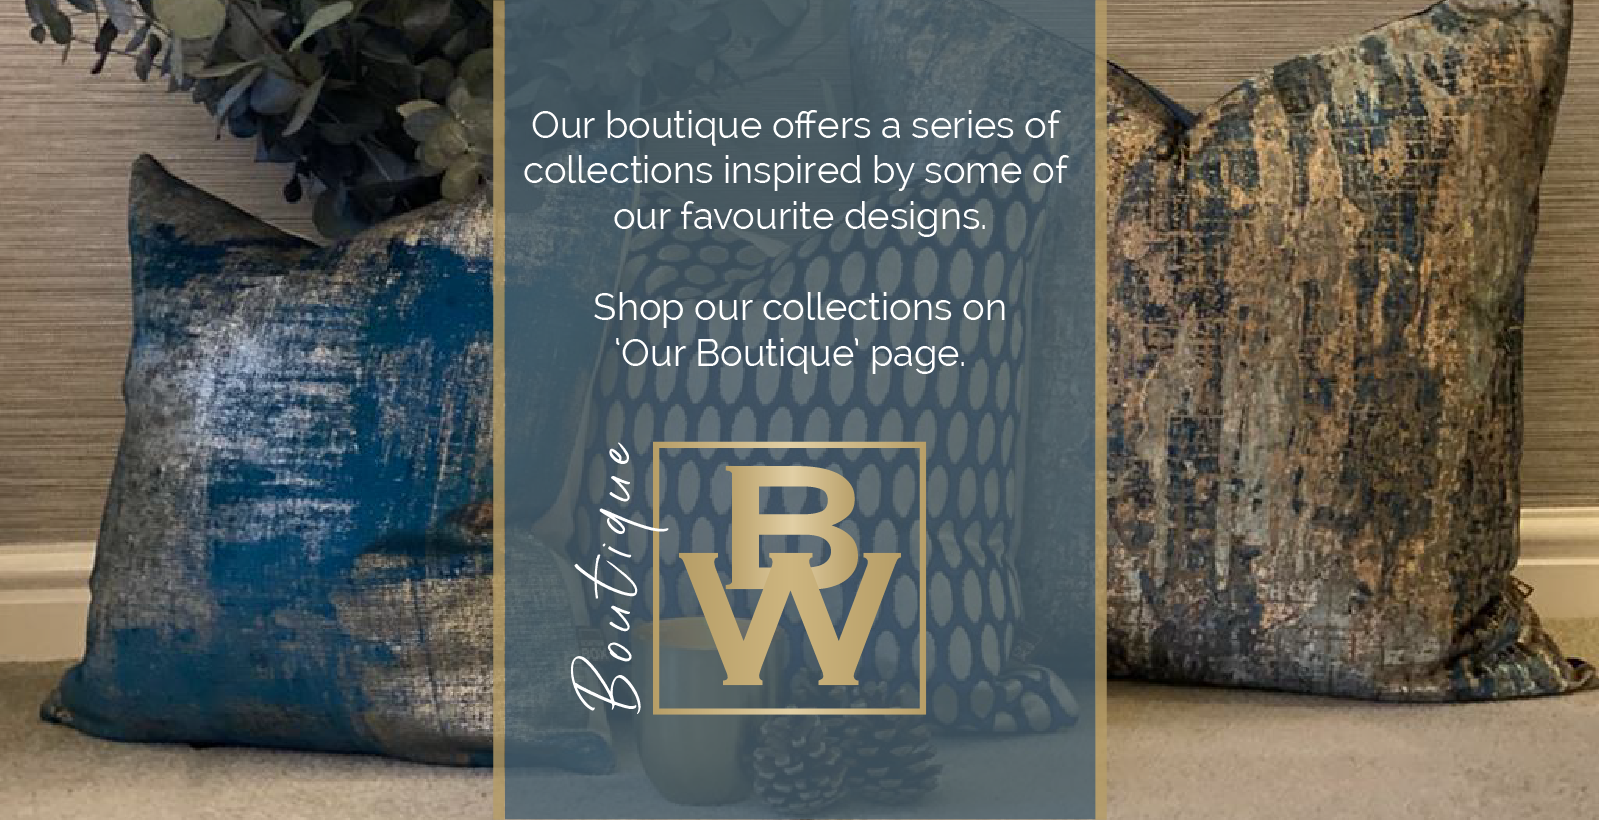 Brownlie|Worsfold Interiors Boutique